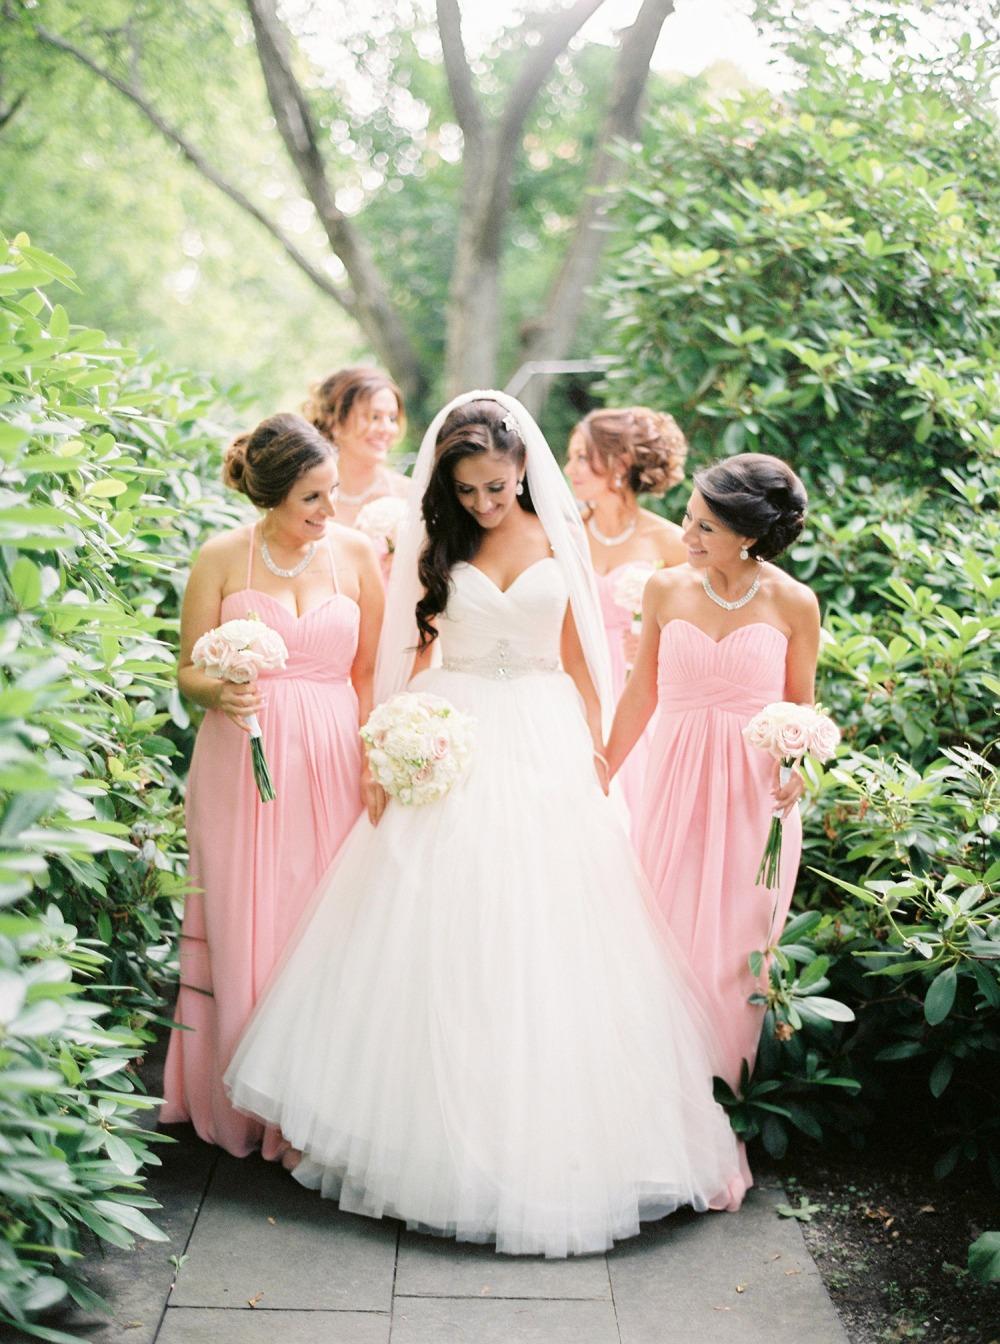 web-2bridesphotography_isabelle_weddings_011